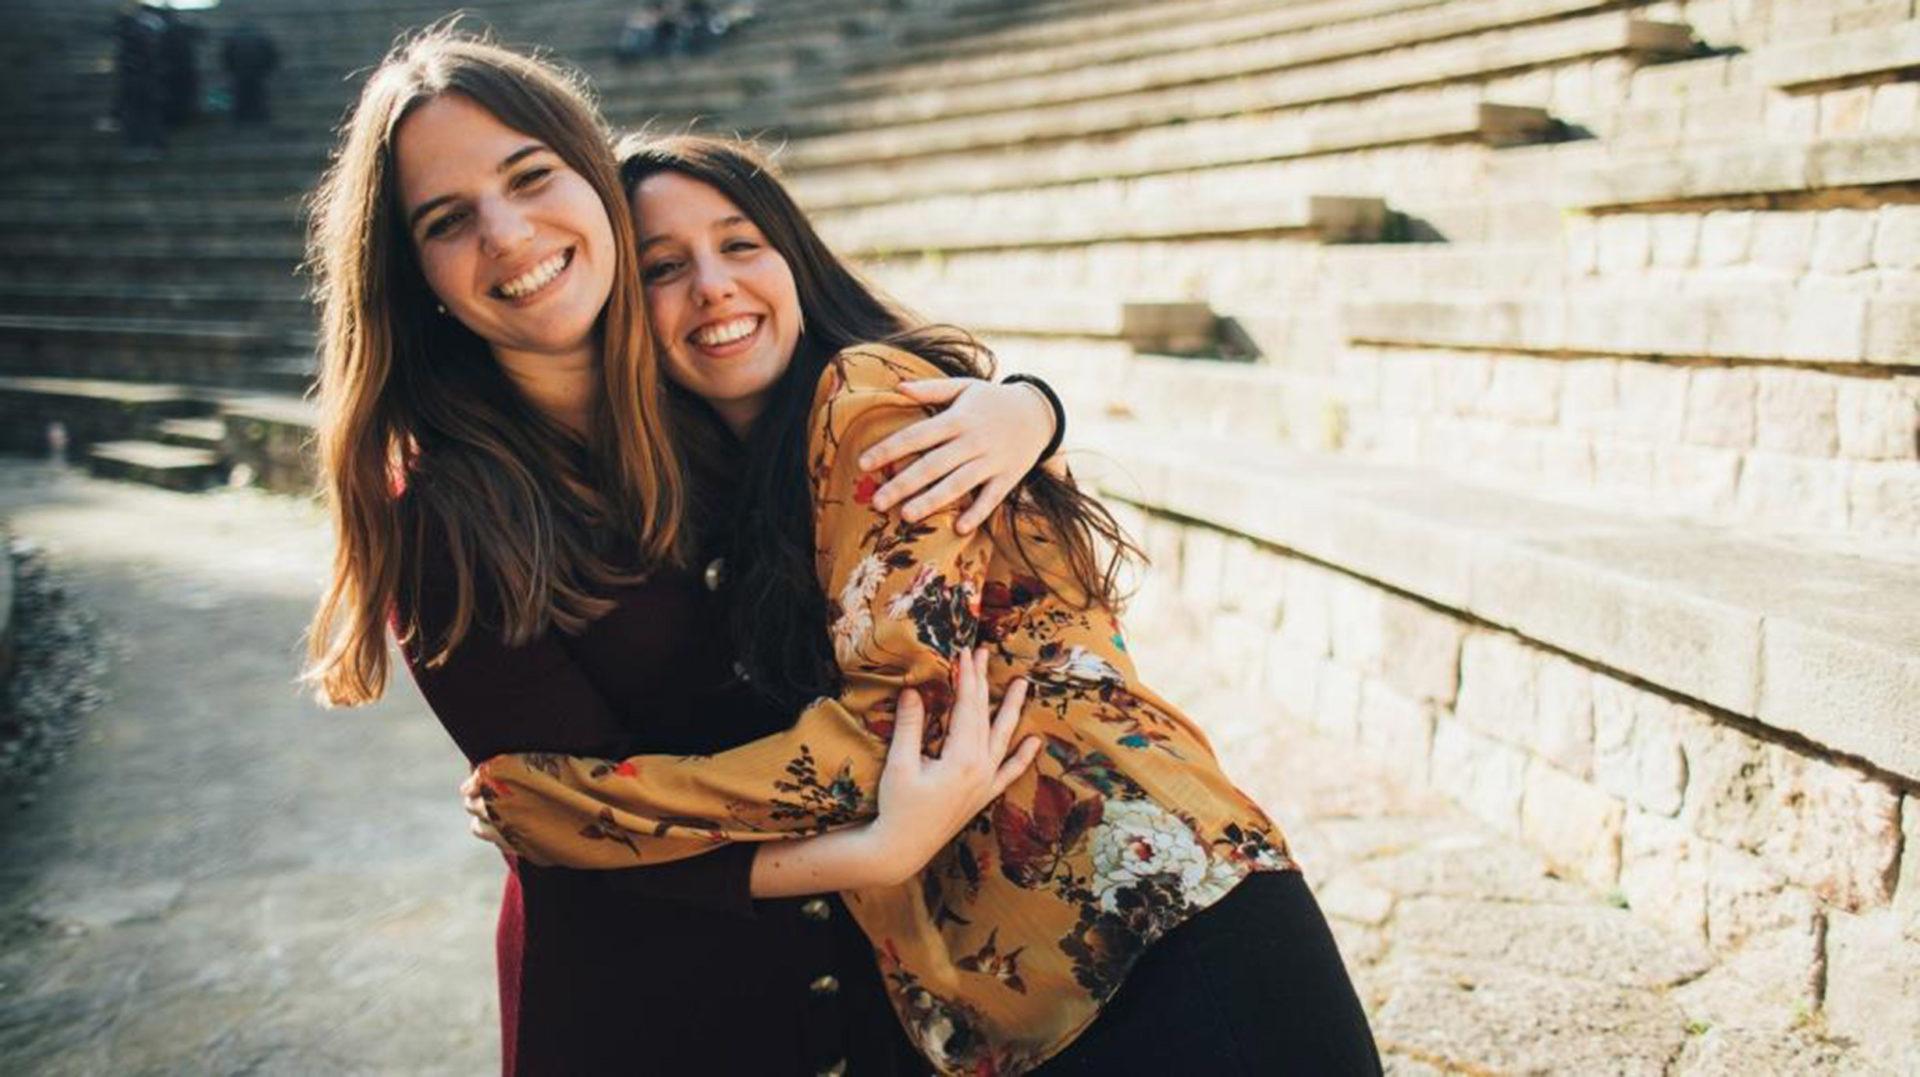 Sandra Bautista i Raquel Lua